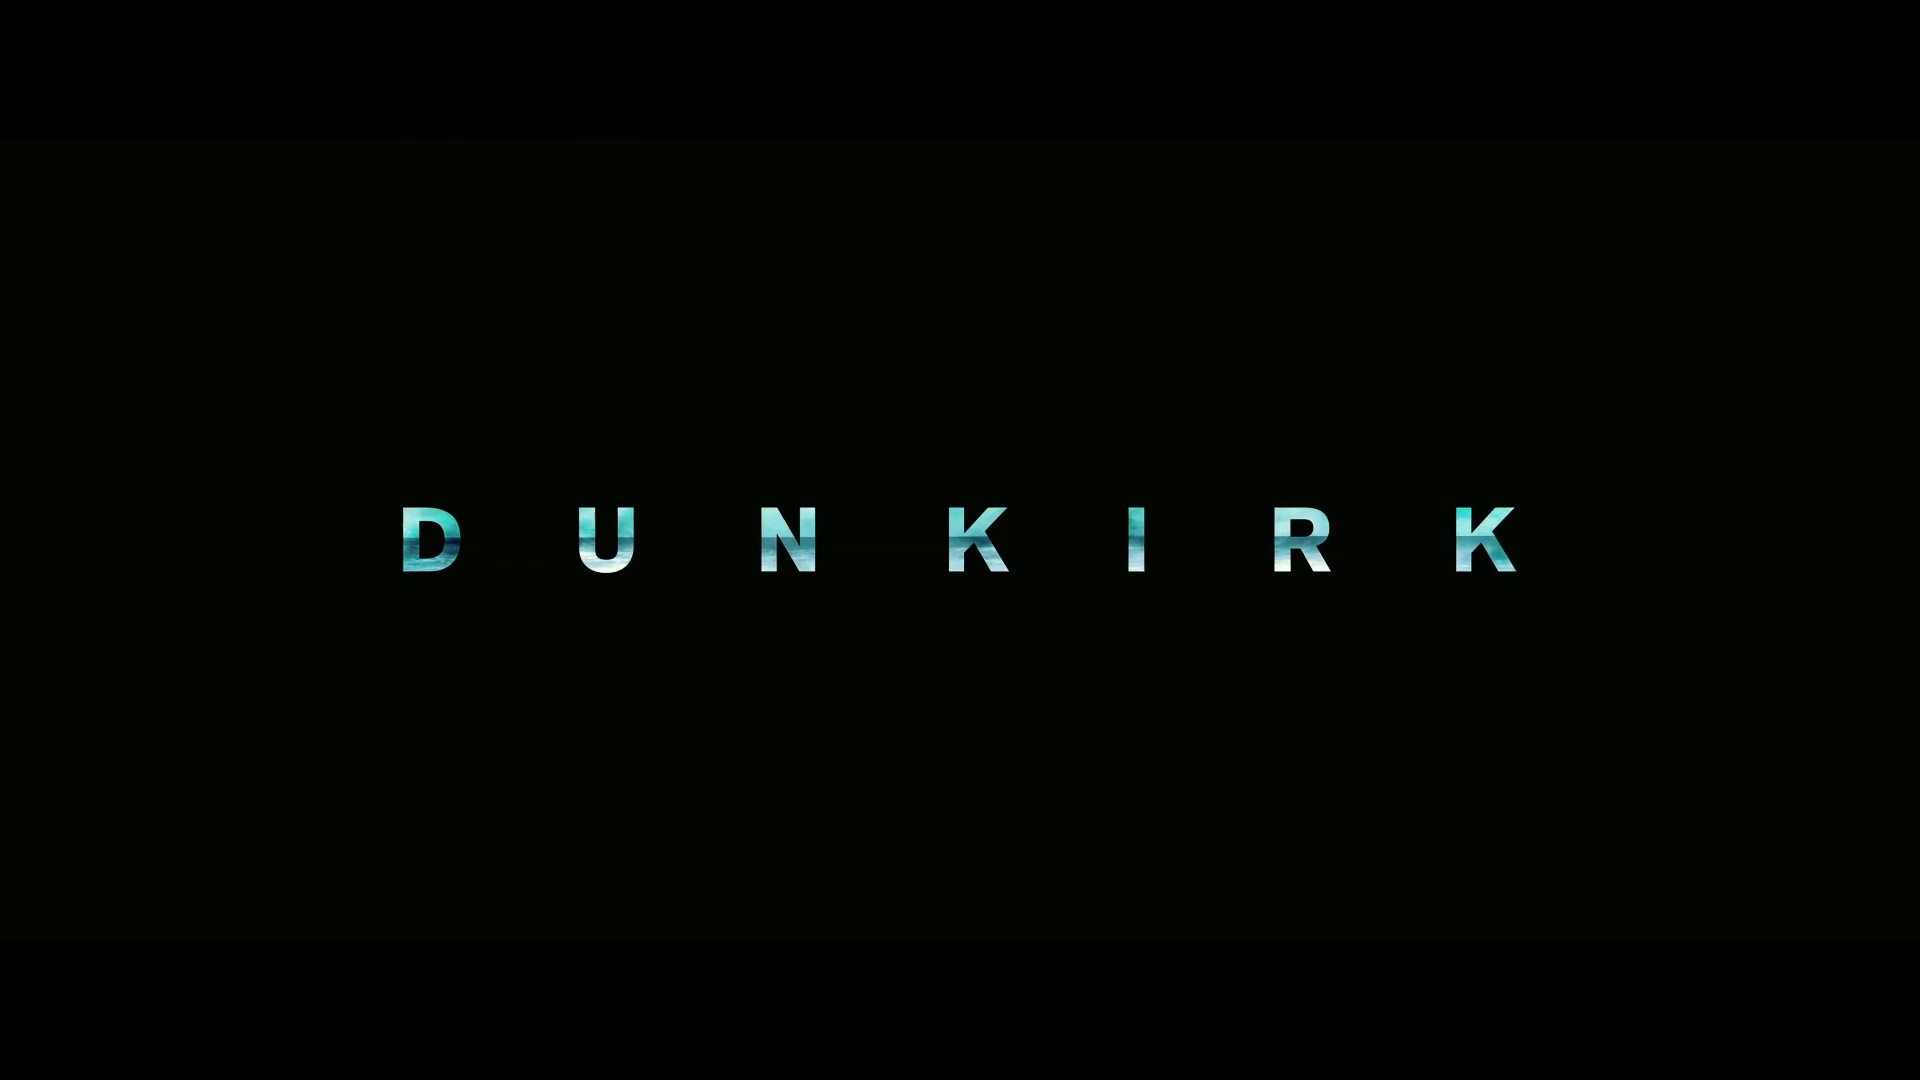 Dunkerque Film Christopher Nolan (2)